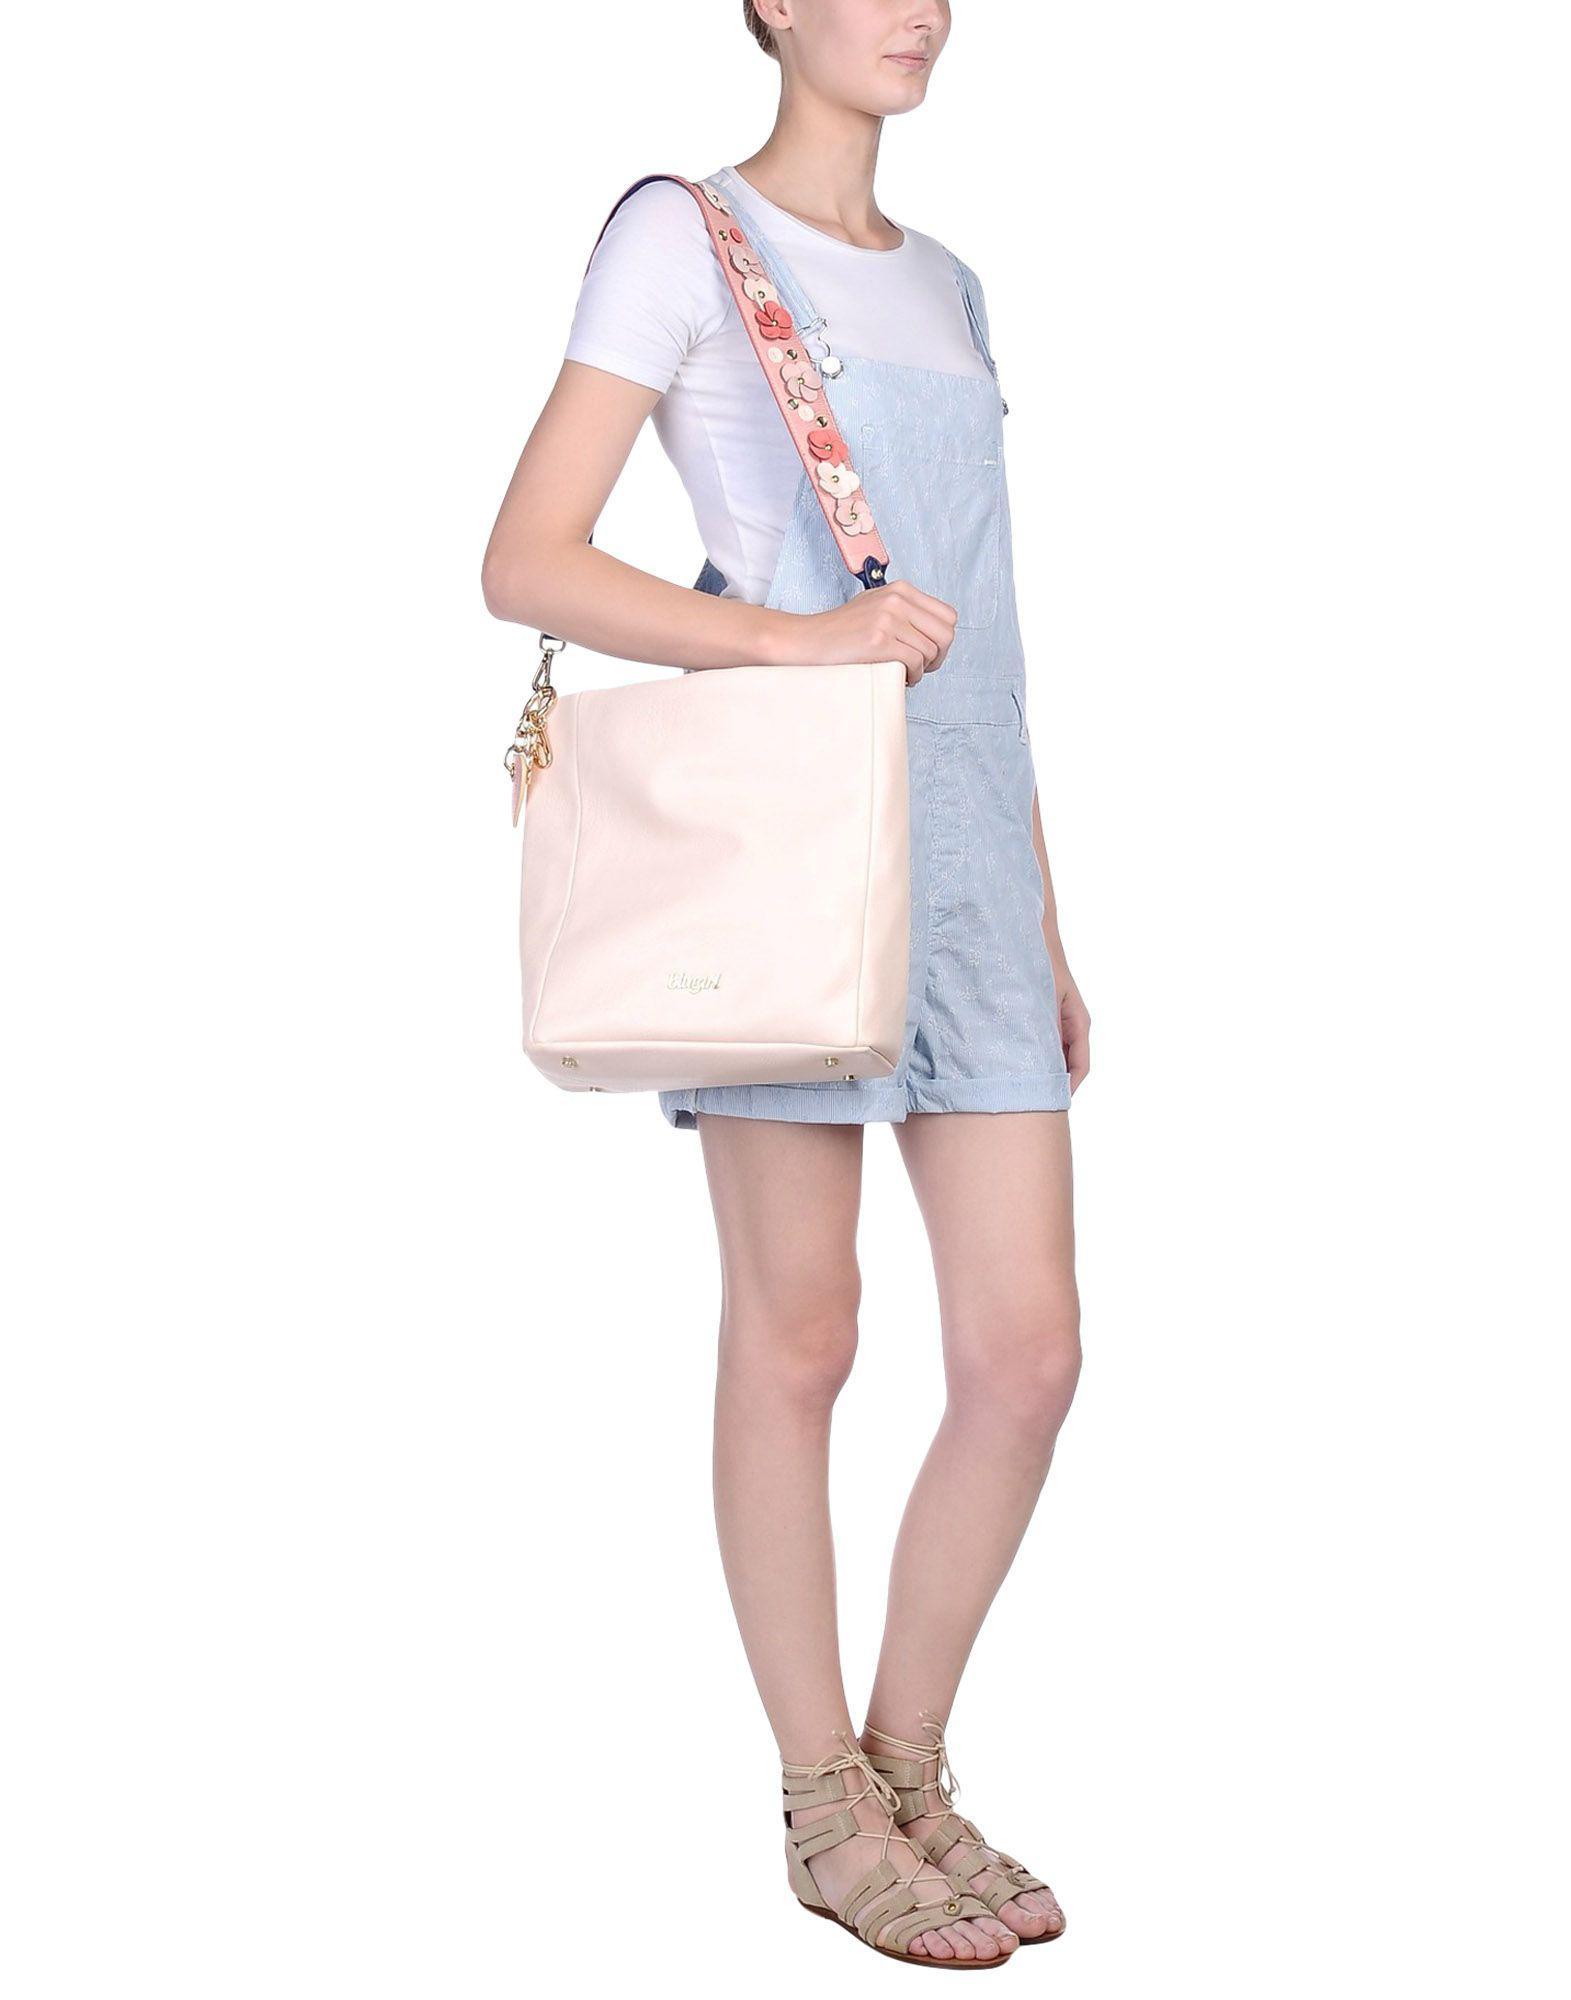 Blugirl Blumarine Cross-body Bag in Light Pink (Pink)